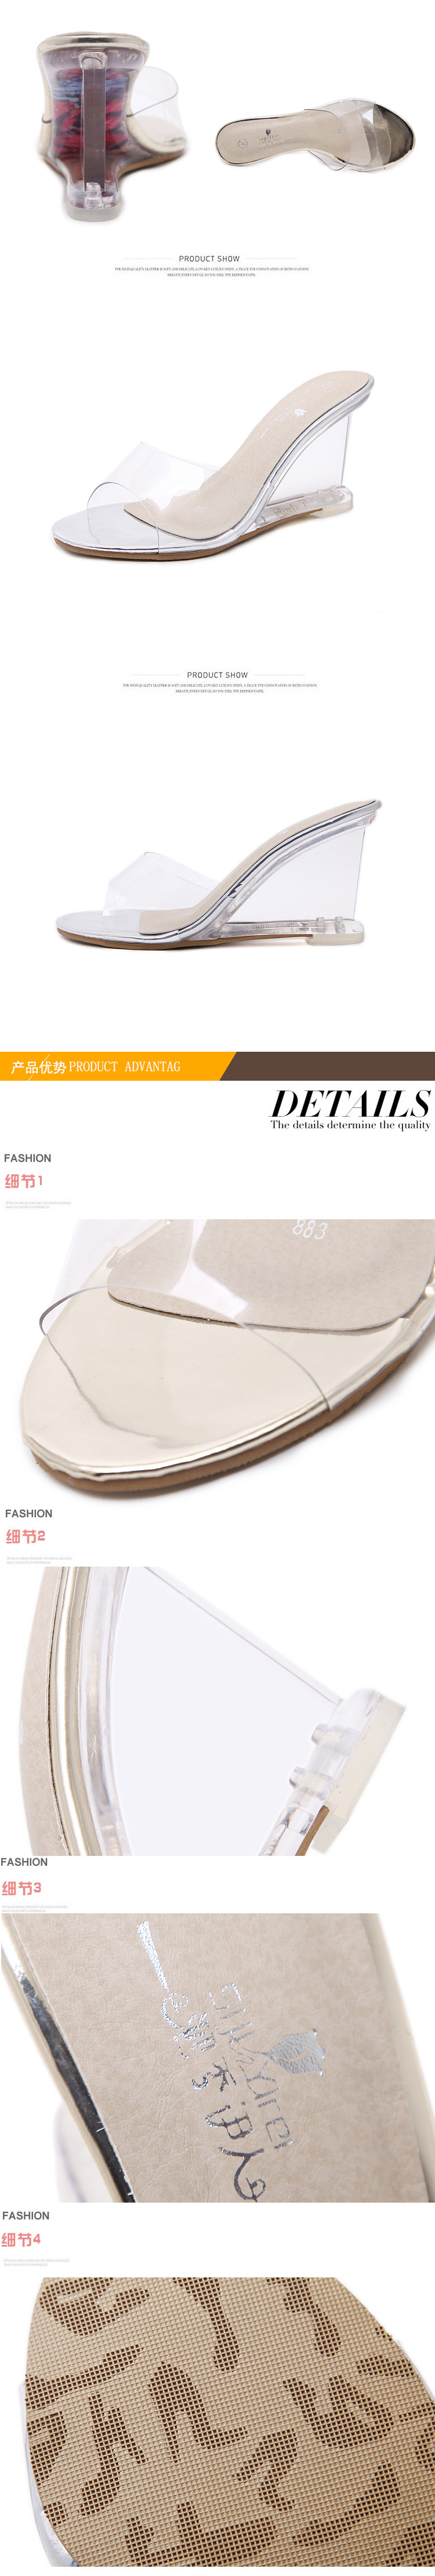 HOKSZVY Women Slipper High Heels Summer Summer Women's Shoes Word Buckle Simple Wedge Sandals Transparent Clear Shoes LFD-833-2